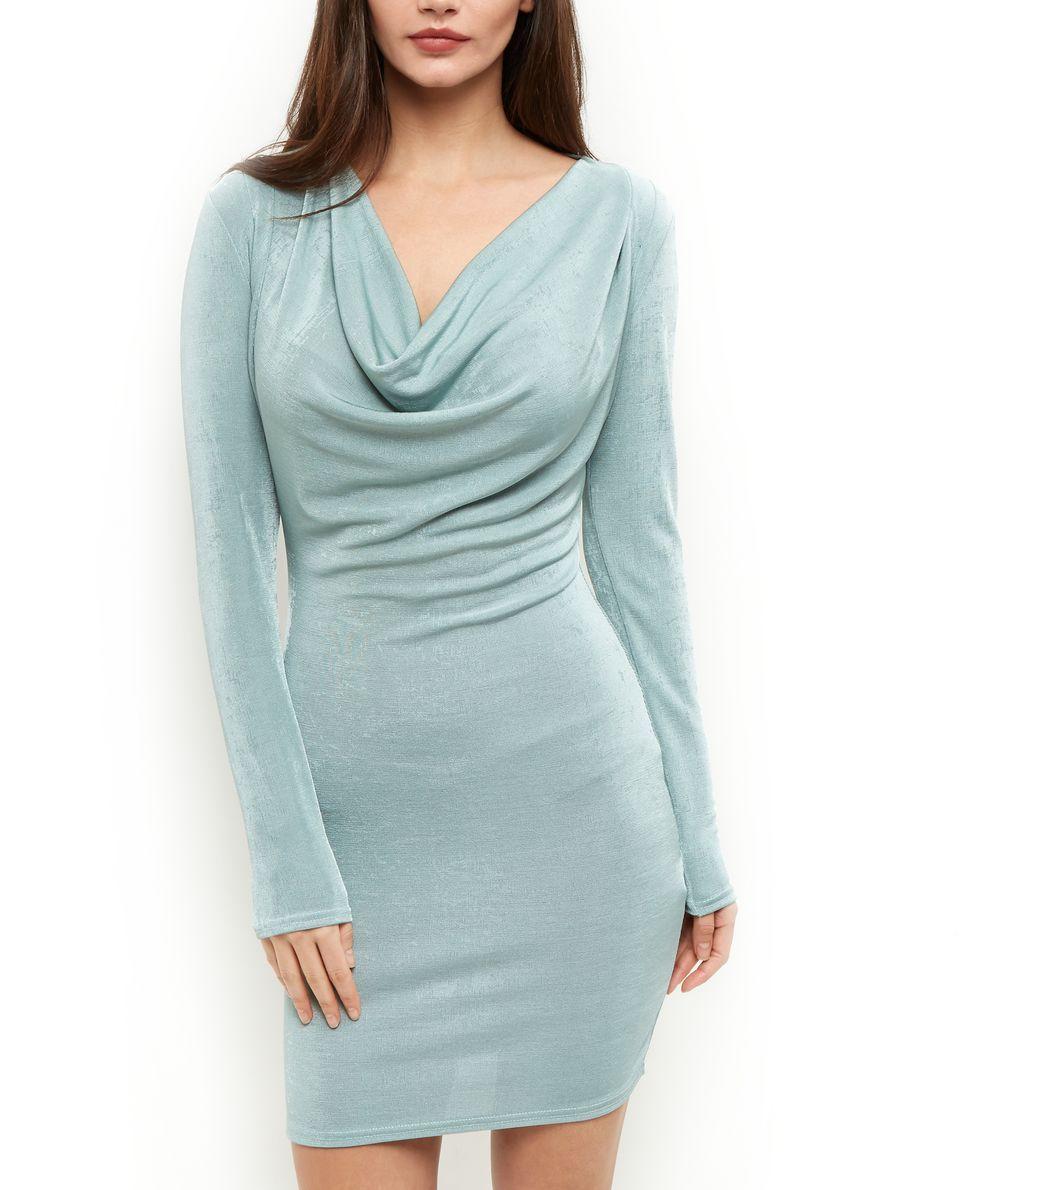 Blue Vanilla Mint Green Cowl Neck Bodycon Dress | Cowl neck, Mint ...